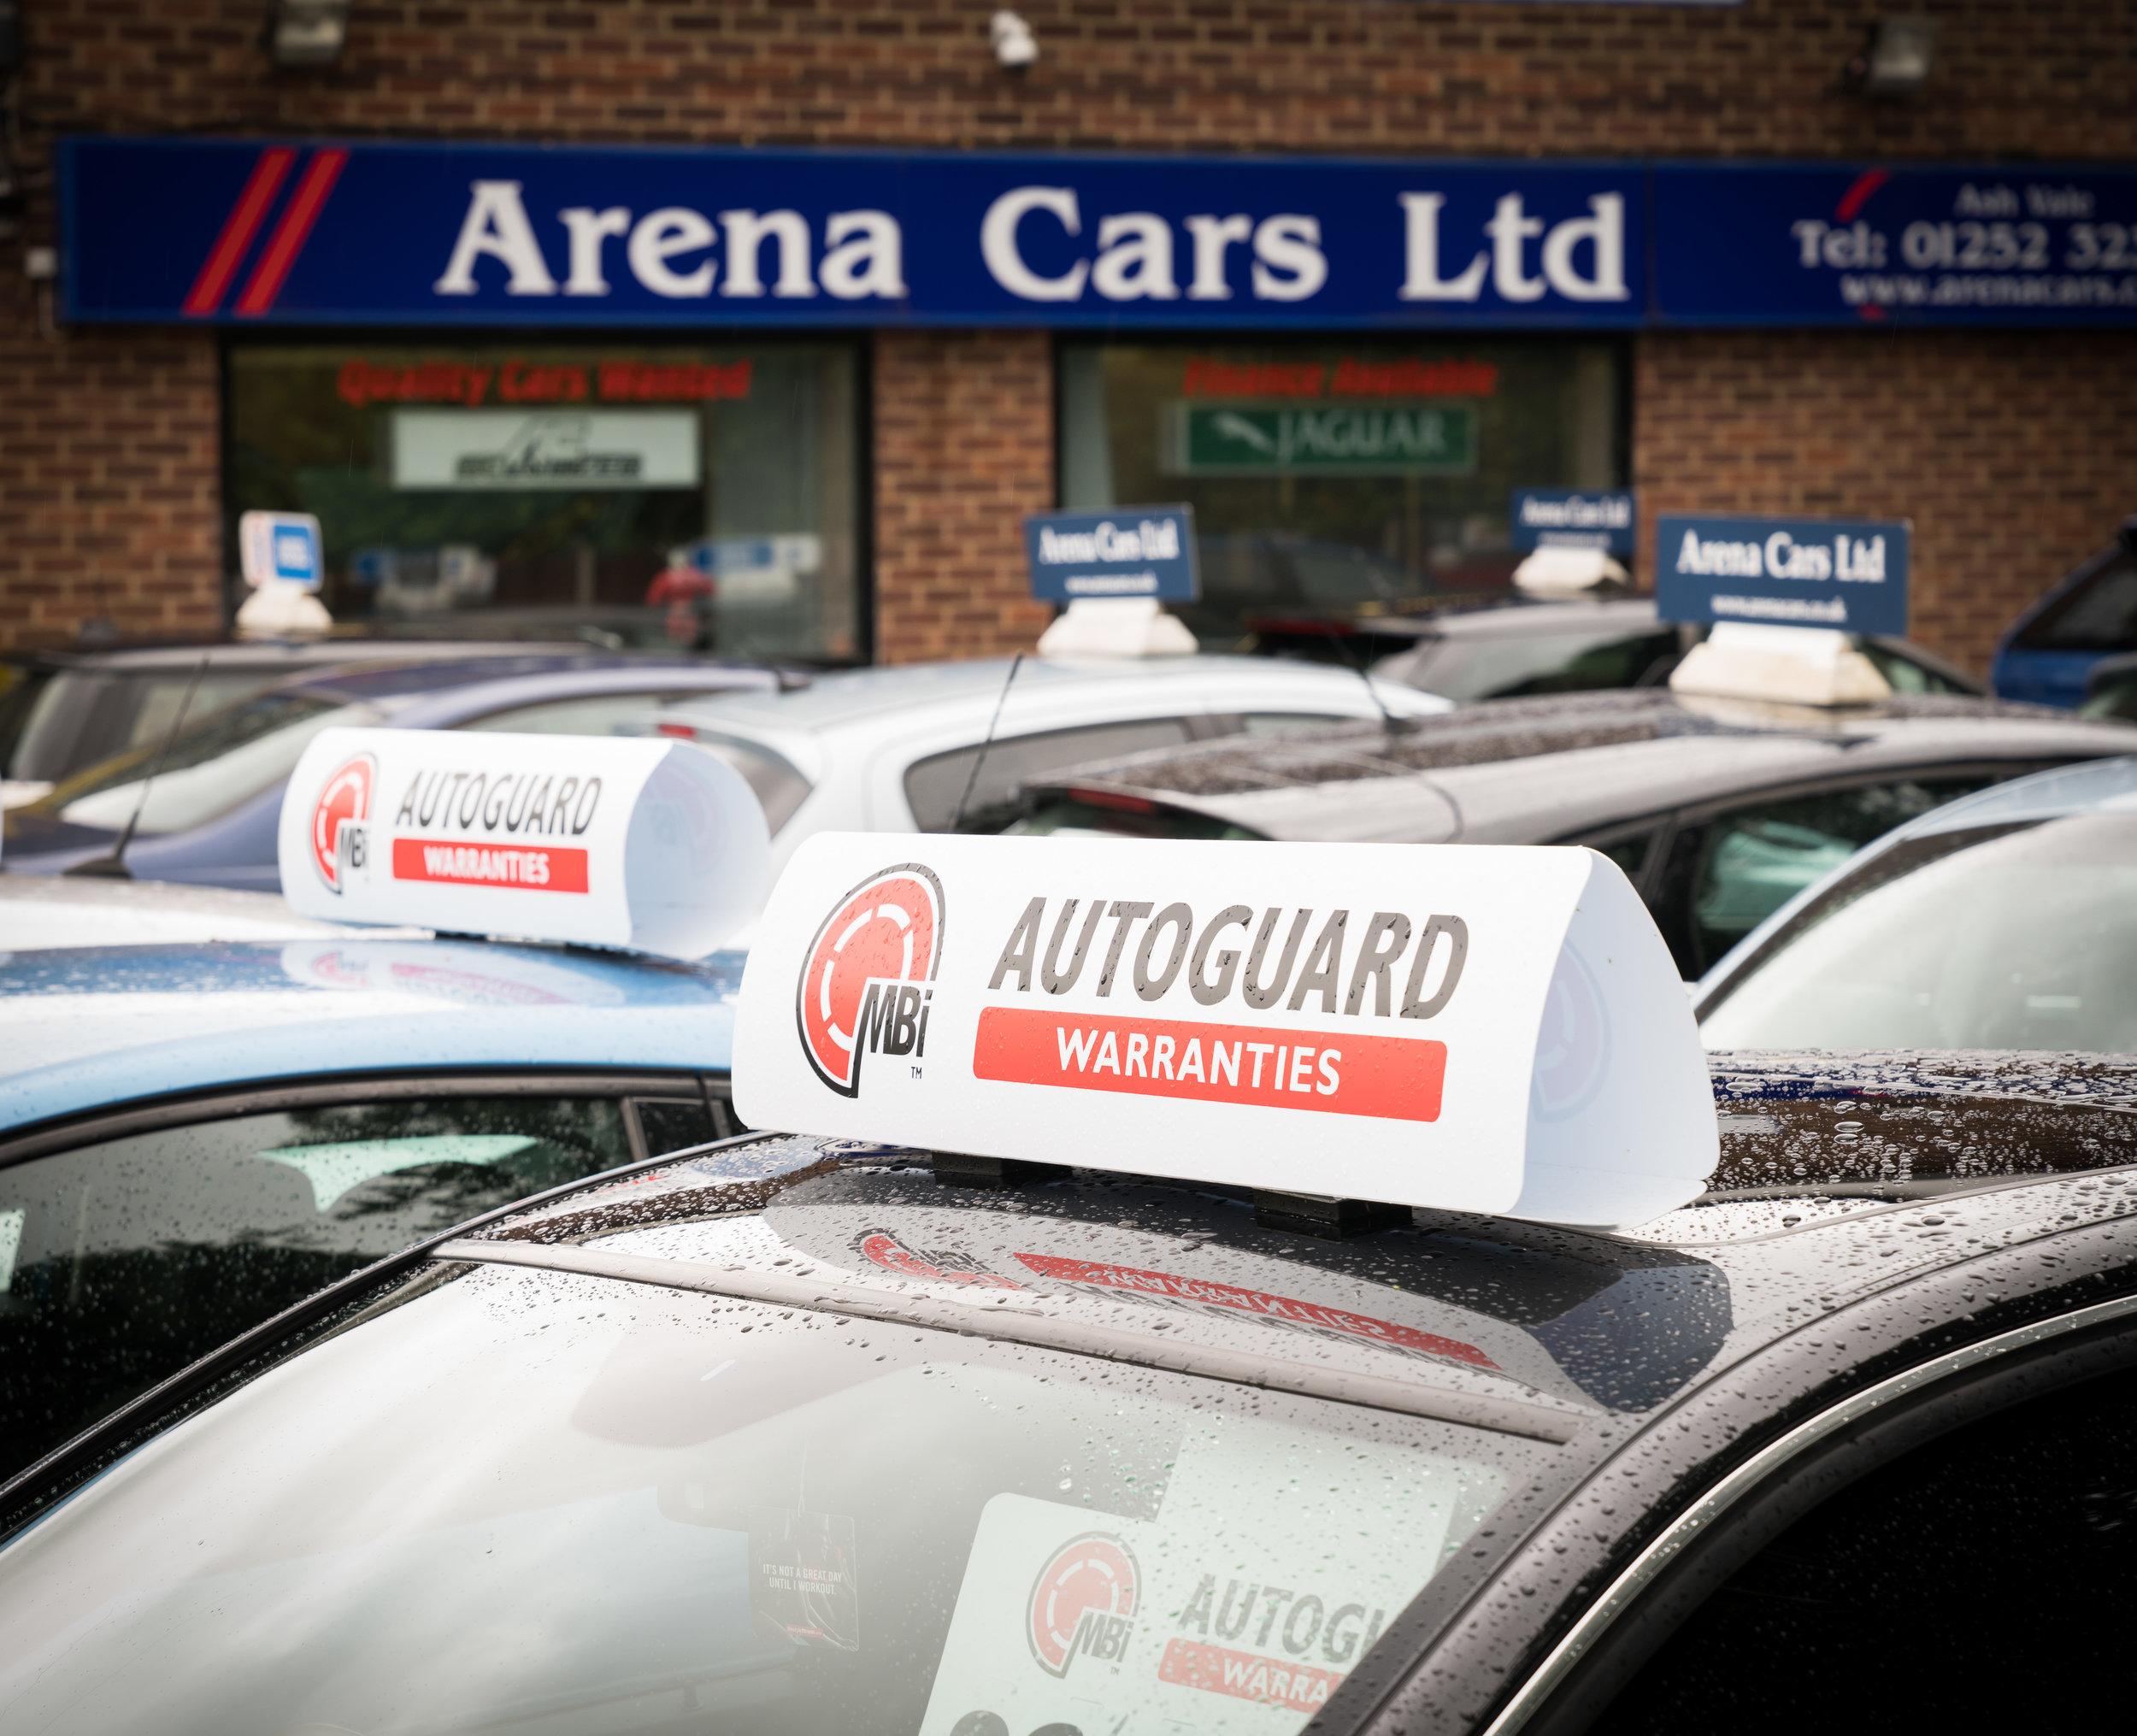 Marketing images for Autoguard Warranties.